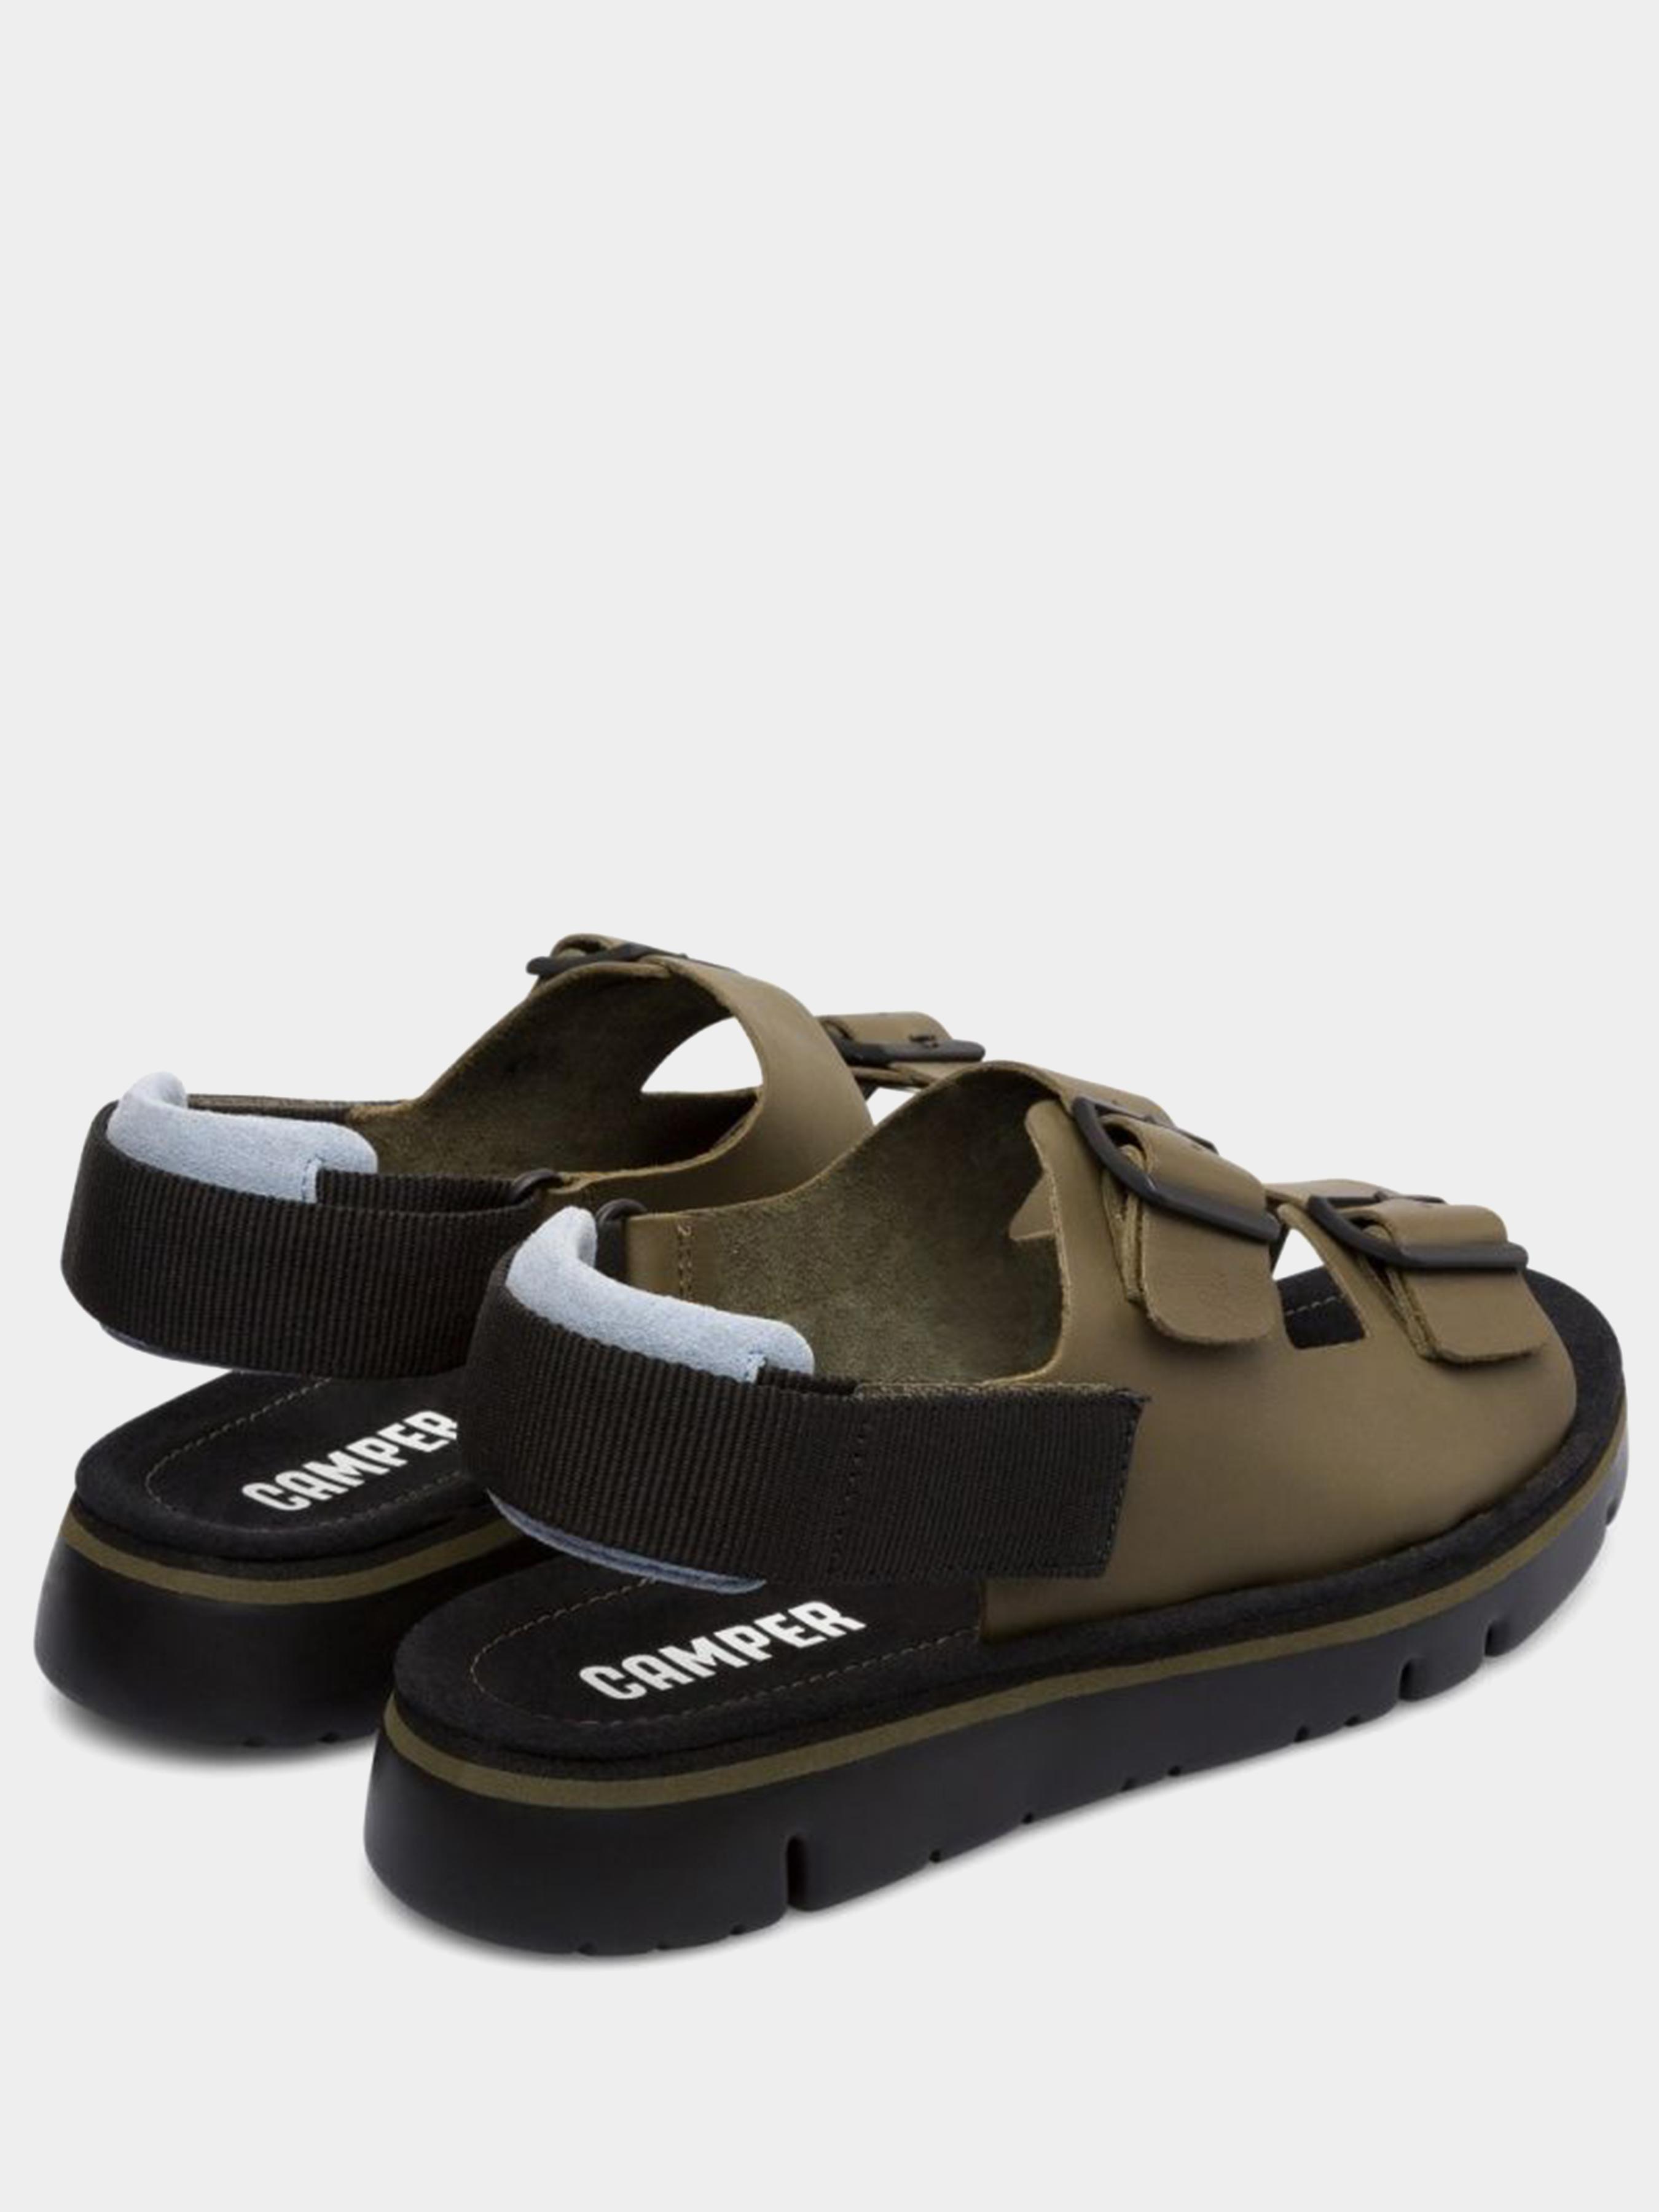 Сандалии мужские Camper Oruga Sandal AM704 Заказать, 2017